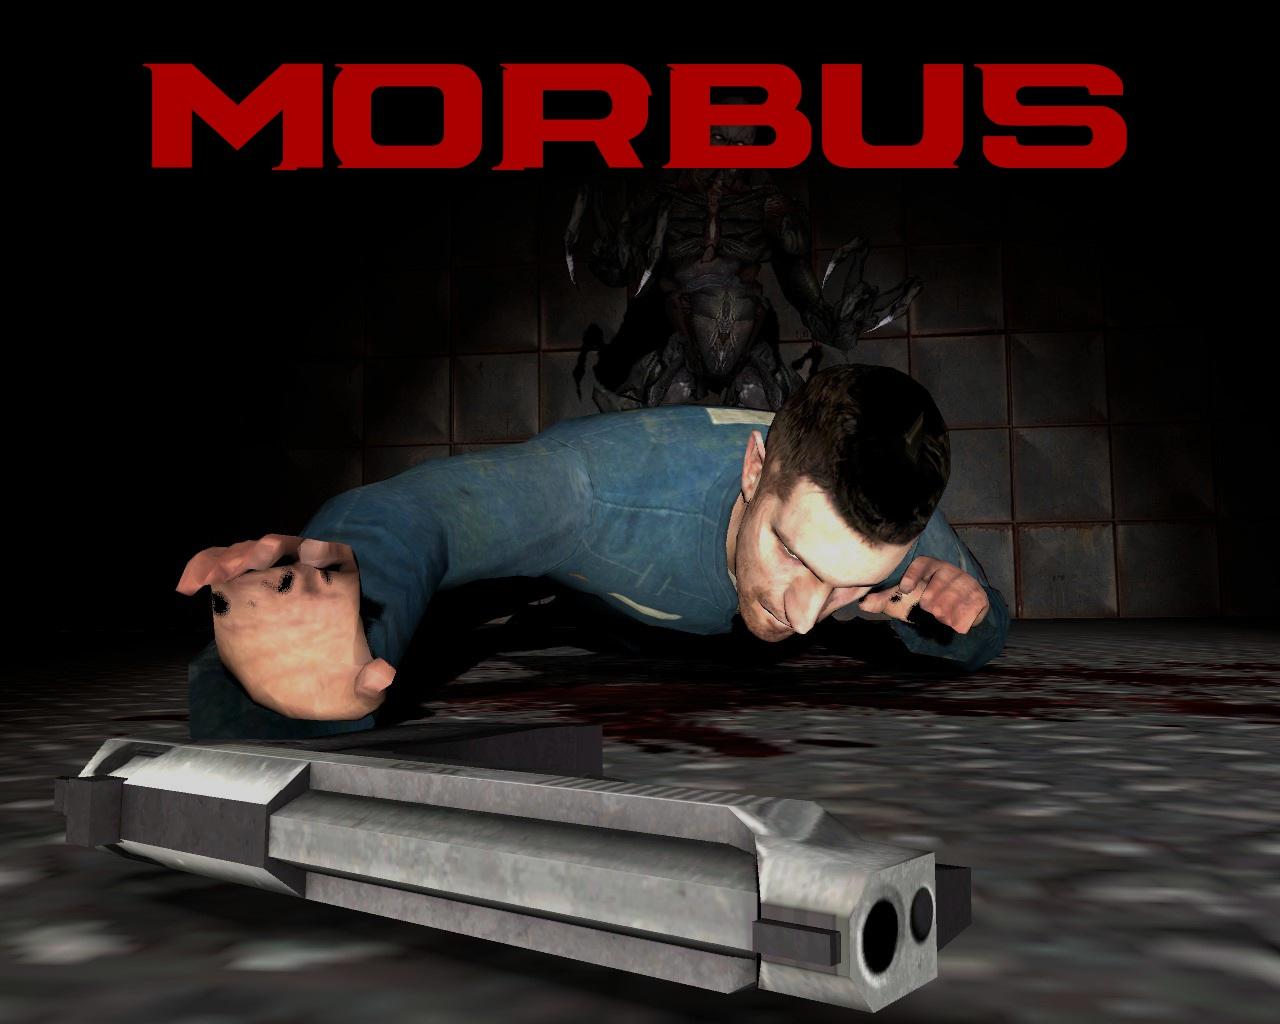 Morbus mod for Garry's Mod - Mod DB